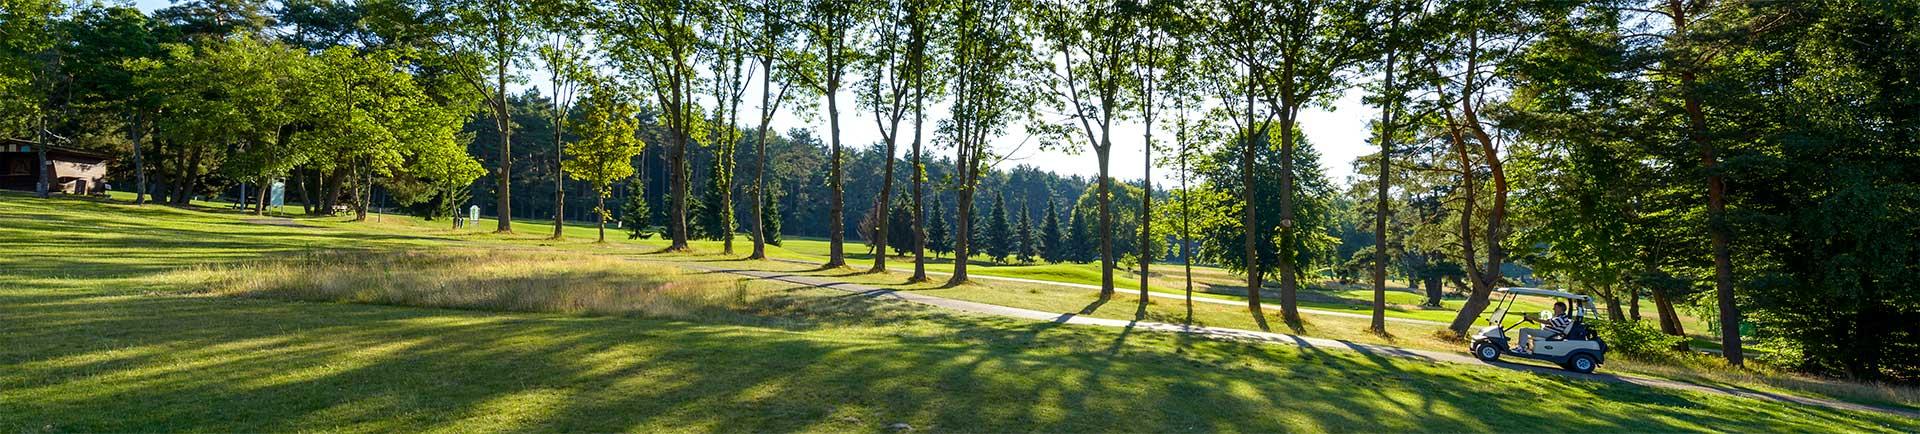 rheinblick-golfcourse-22